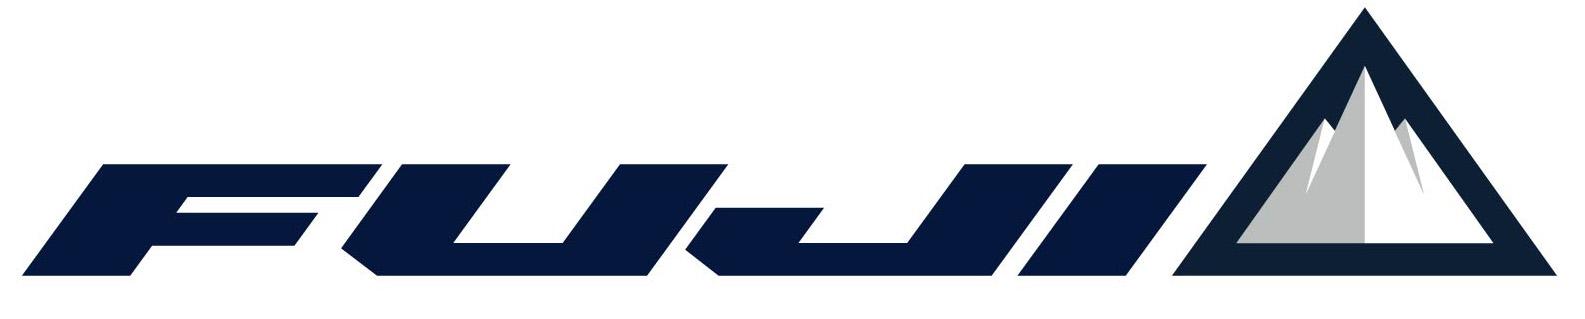 「FUJI logo」の画像検索結果